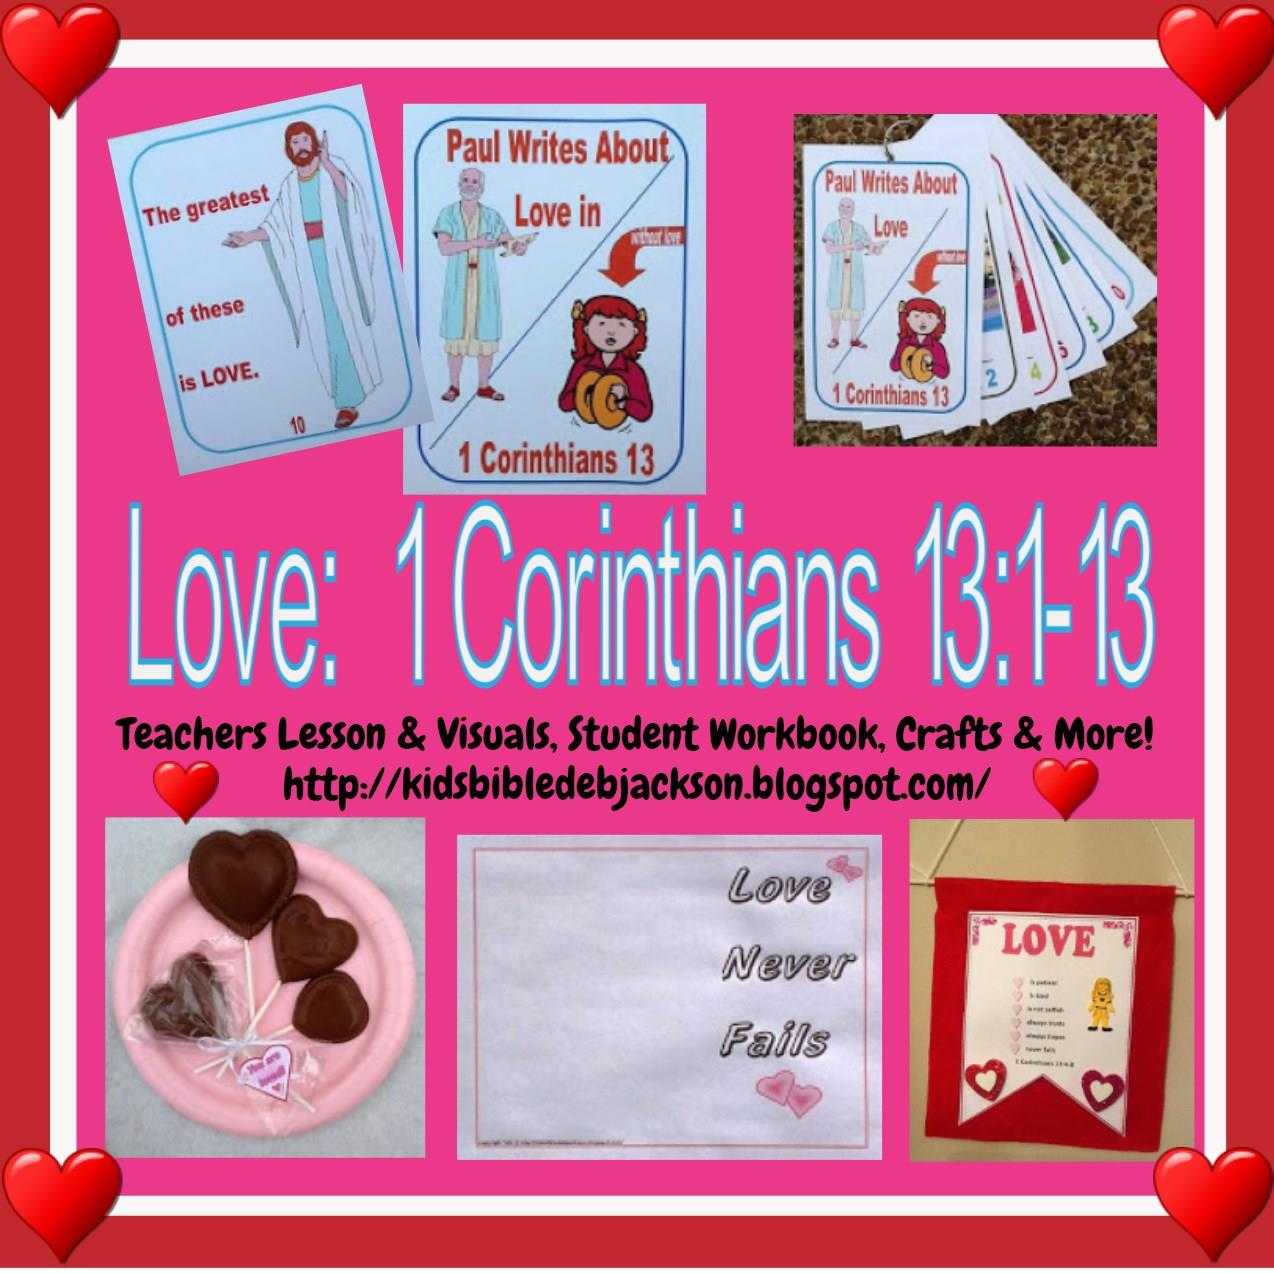 http://kidsbibledebjackson.blogspot.com/2013/05/34-love-in-1-corinthians-13.html